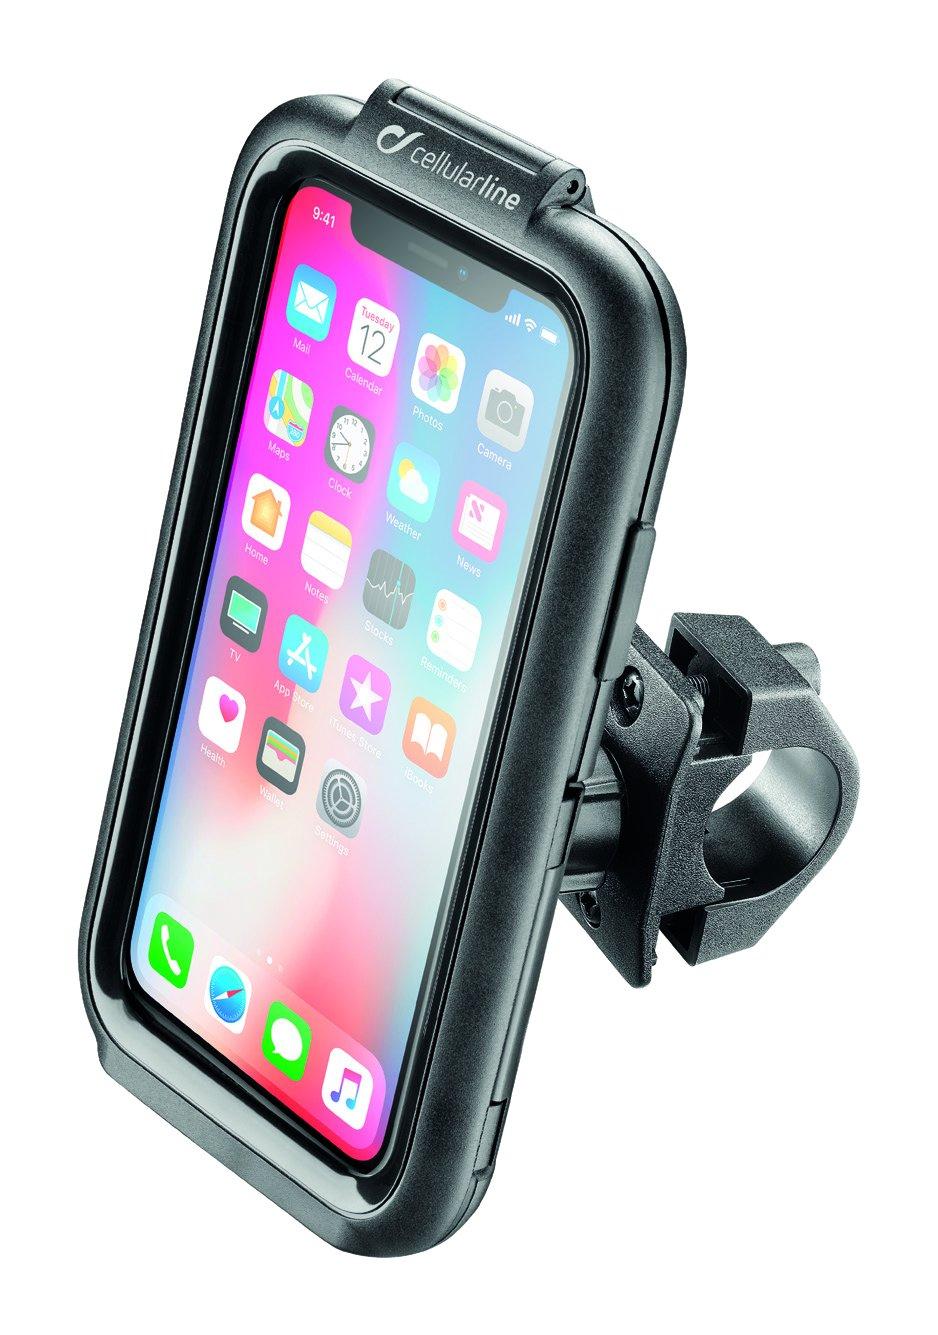 Cellularline SMIPHONEX - Soporte (Teléfono móvil/Smartphone, Bicicleta/Coche, Negro, Soporte pasivo, Apple iPhone X, 300 g): Amazon.es: Electrónica